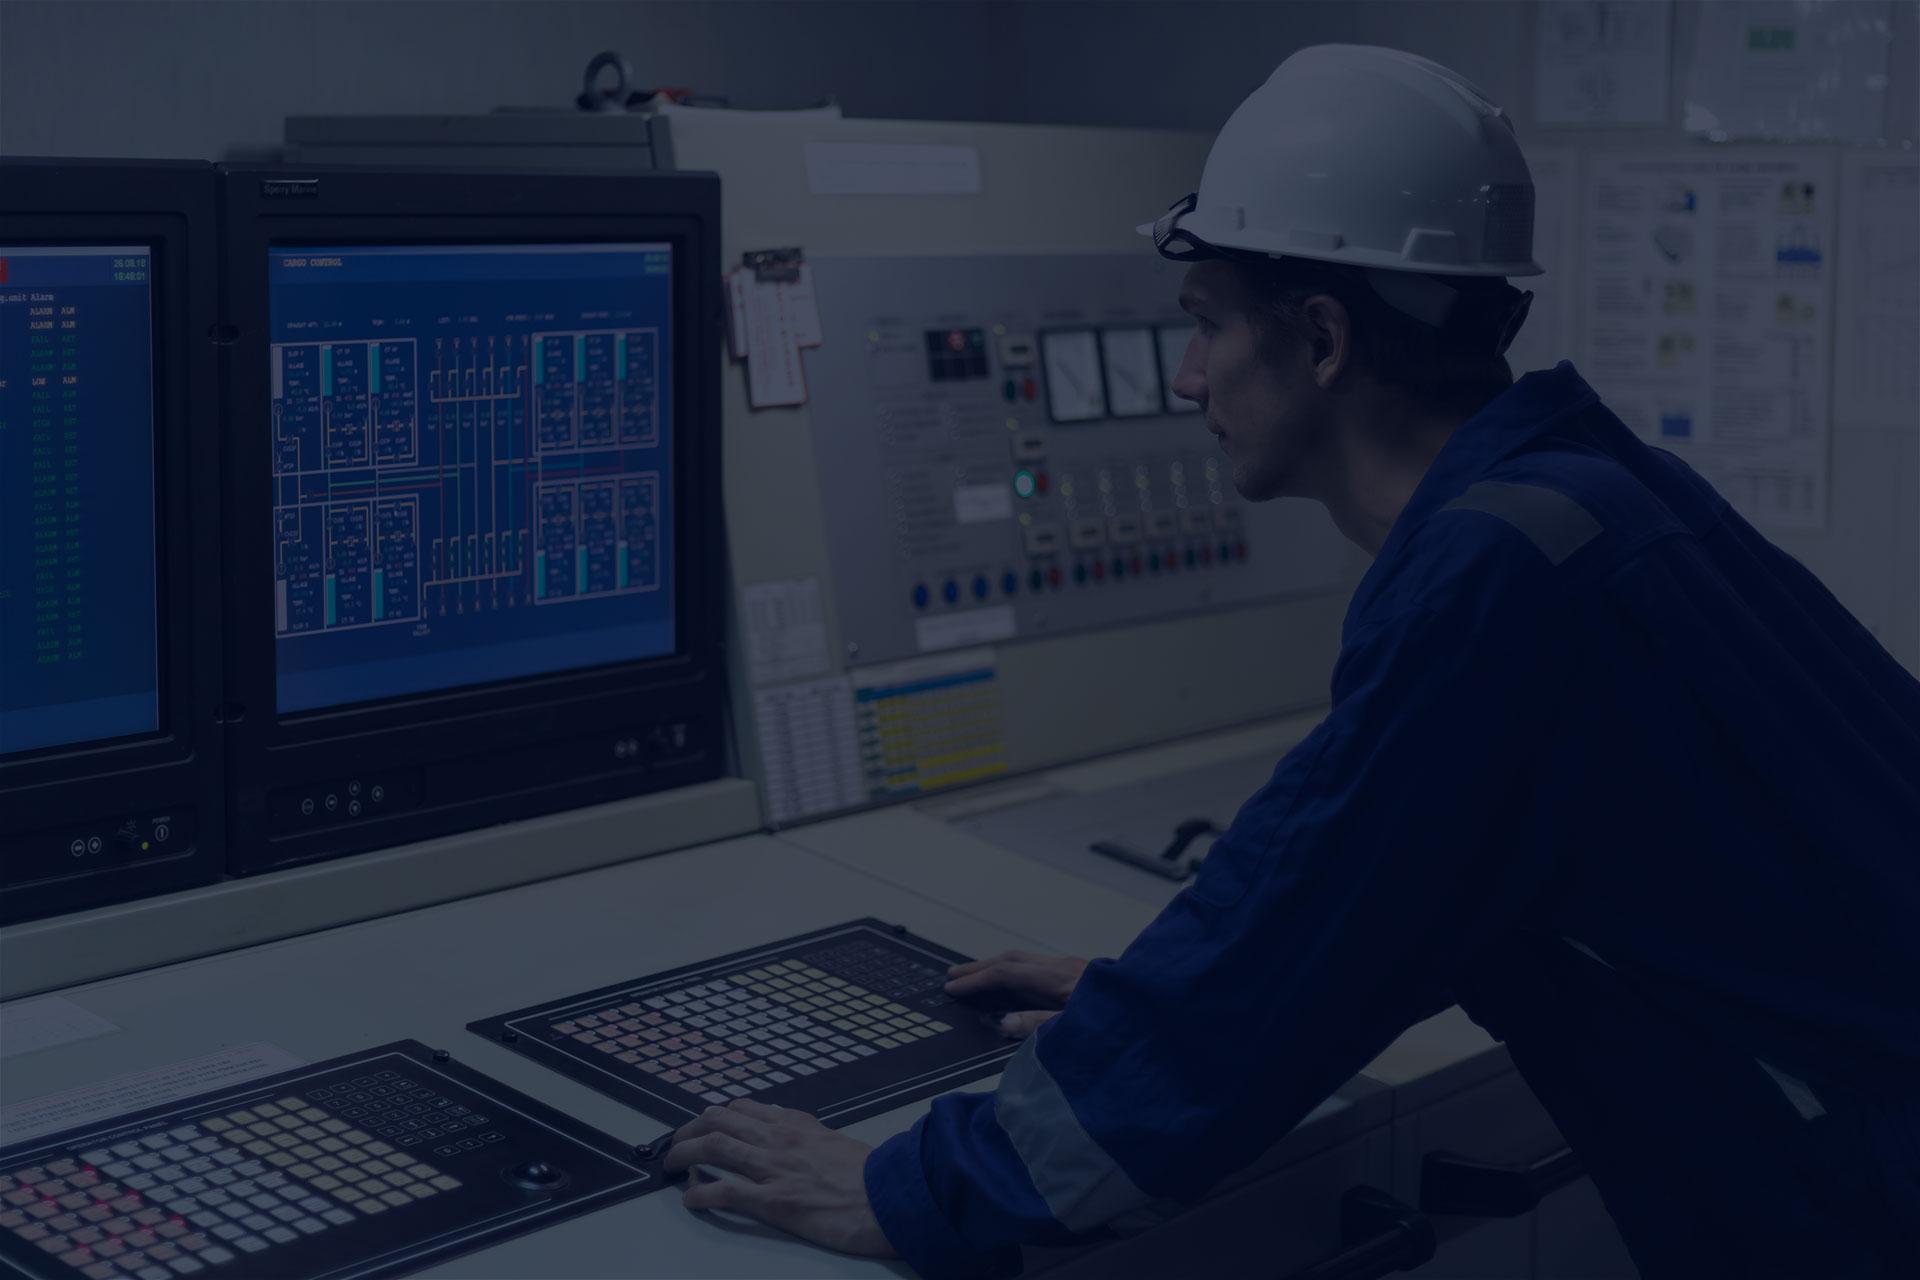 Nemacom Industrial Touchscreen Displays, Industrial PCs & Panel PCs